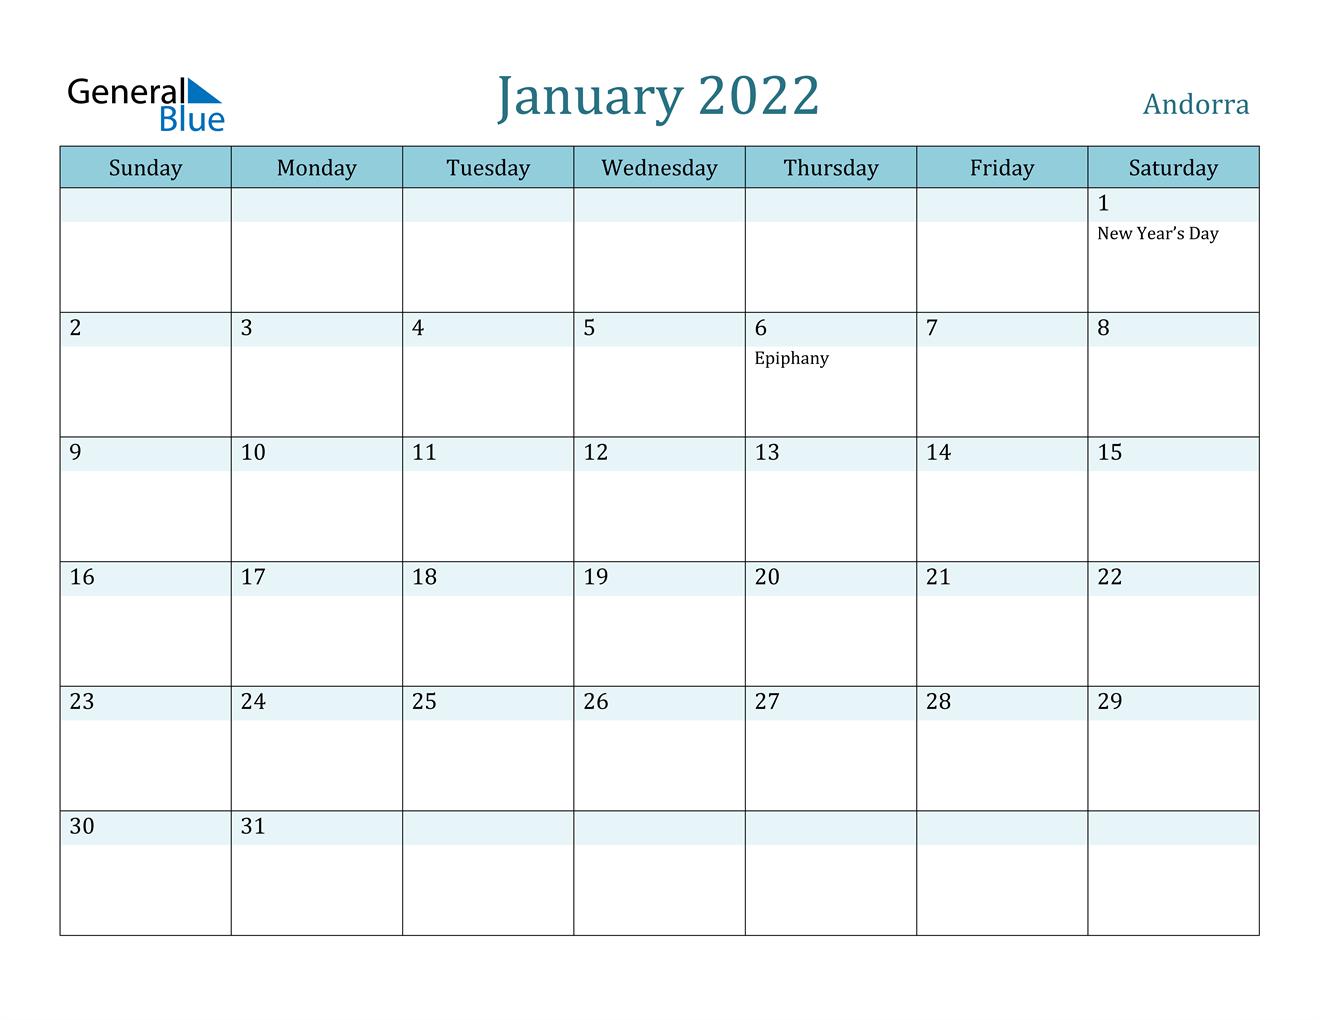 Andorra January 2022 Calendar With Holidays For Januarycalendar 2022 With Holidays